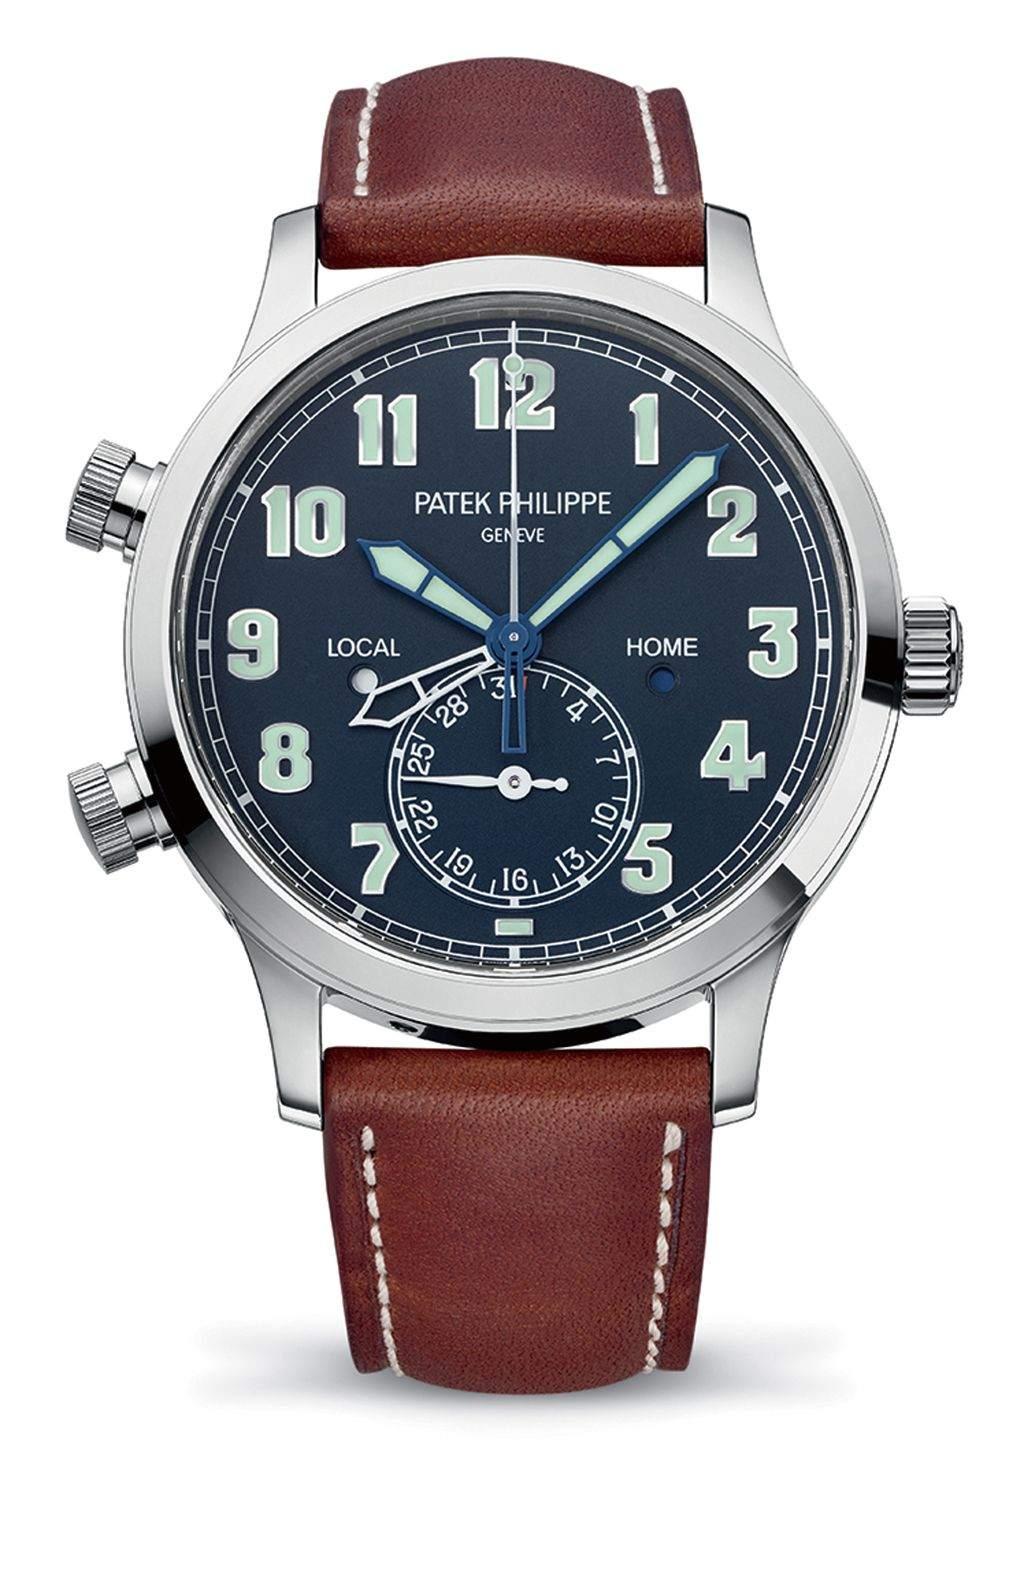 5524G-001 Calatrava Pilot Travel Time 飛行家旅行時間腕錶